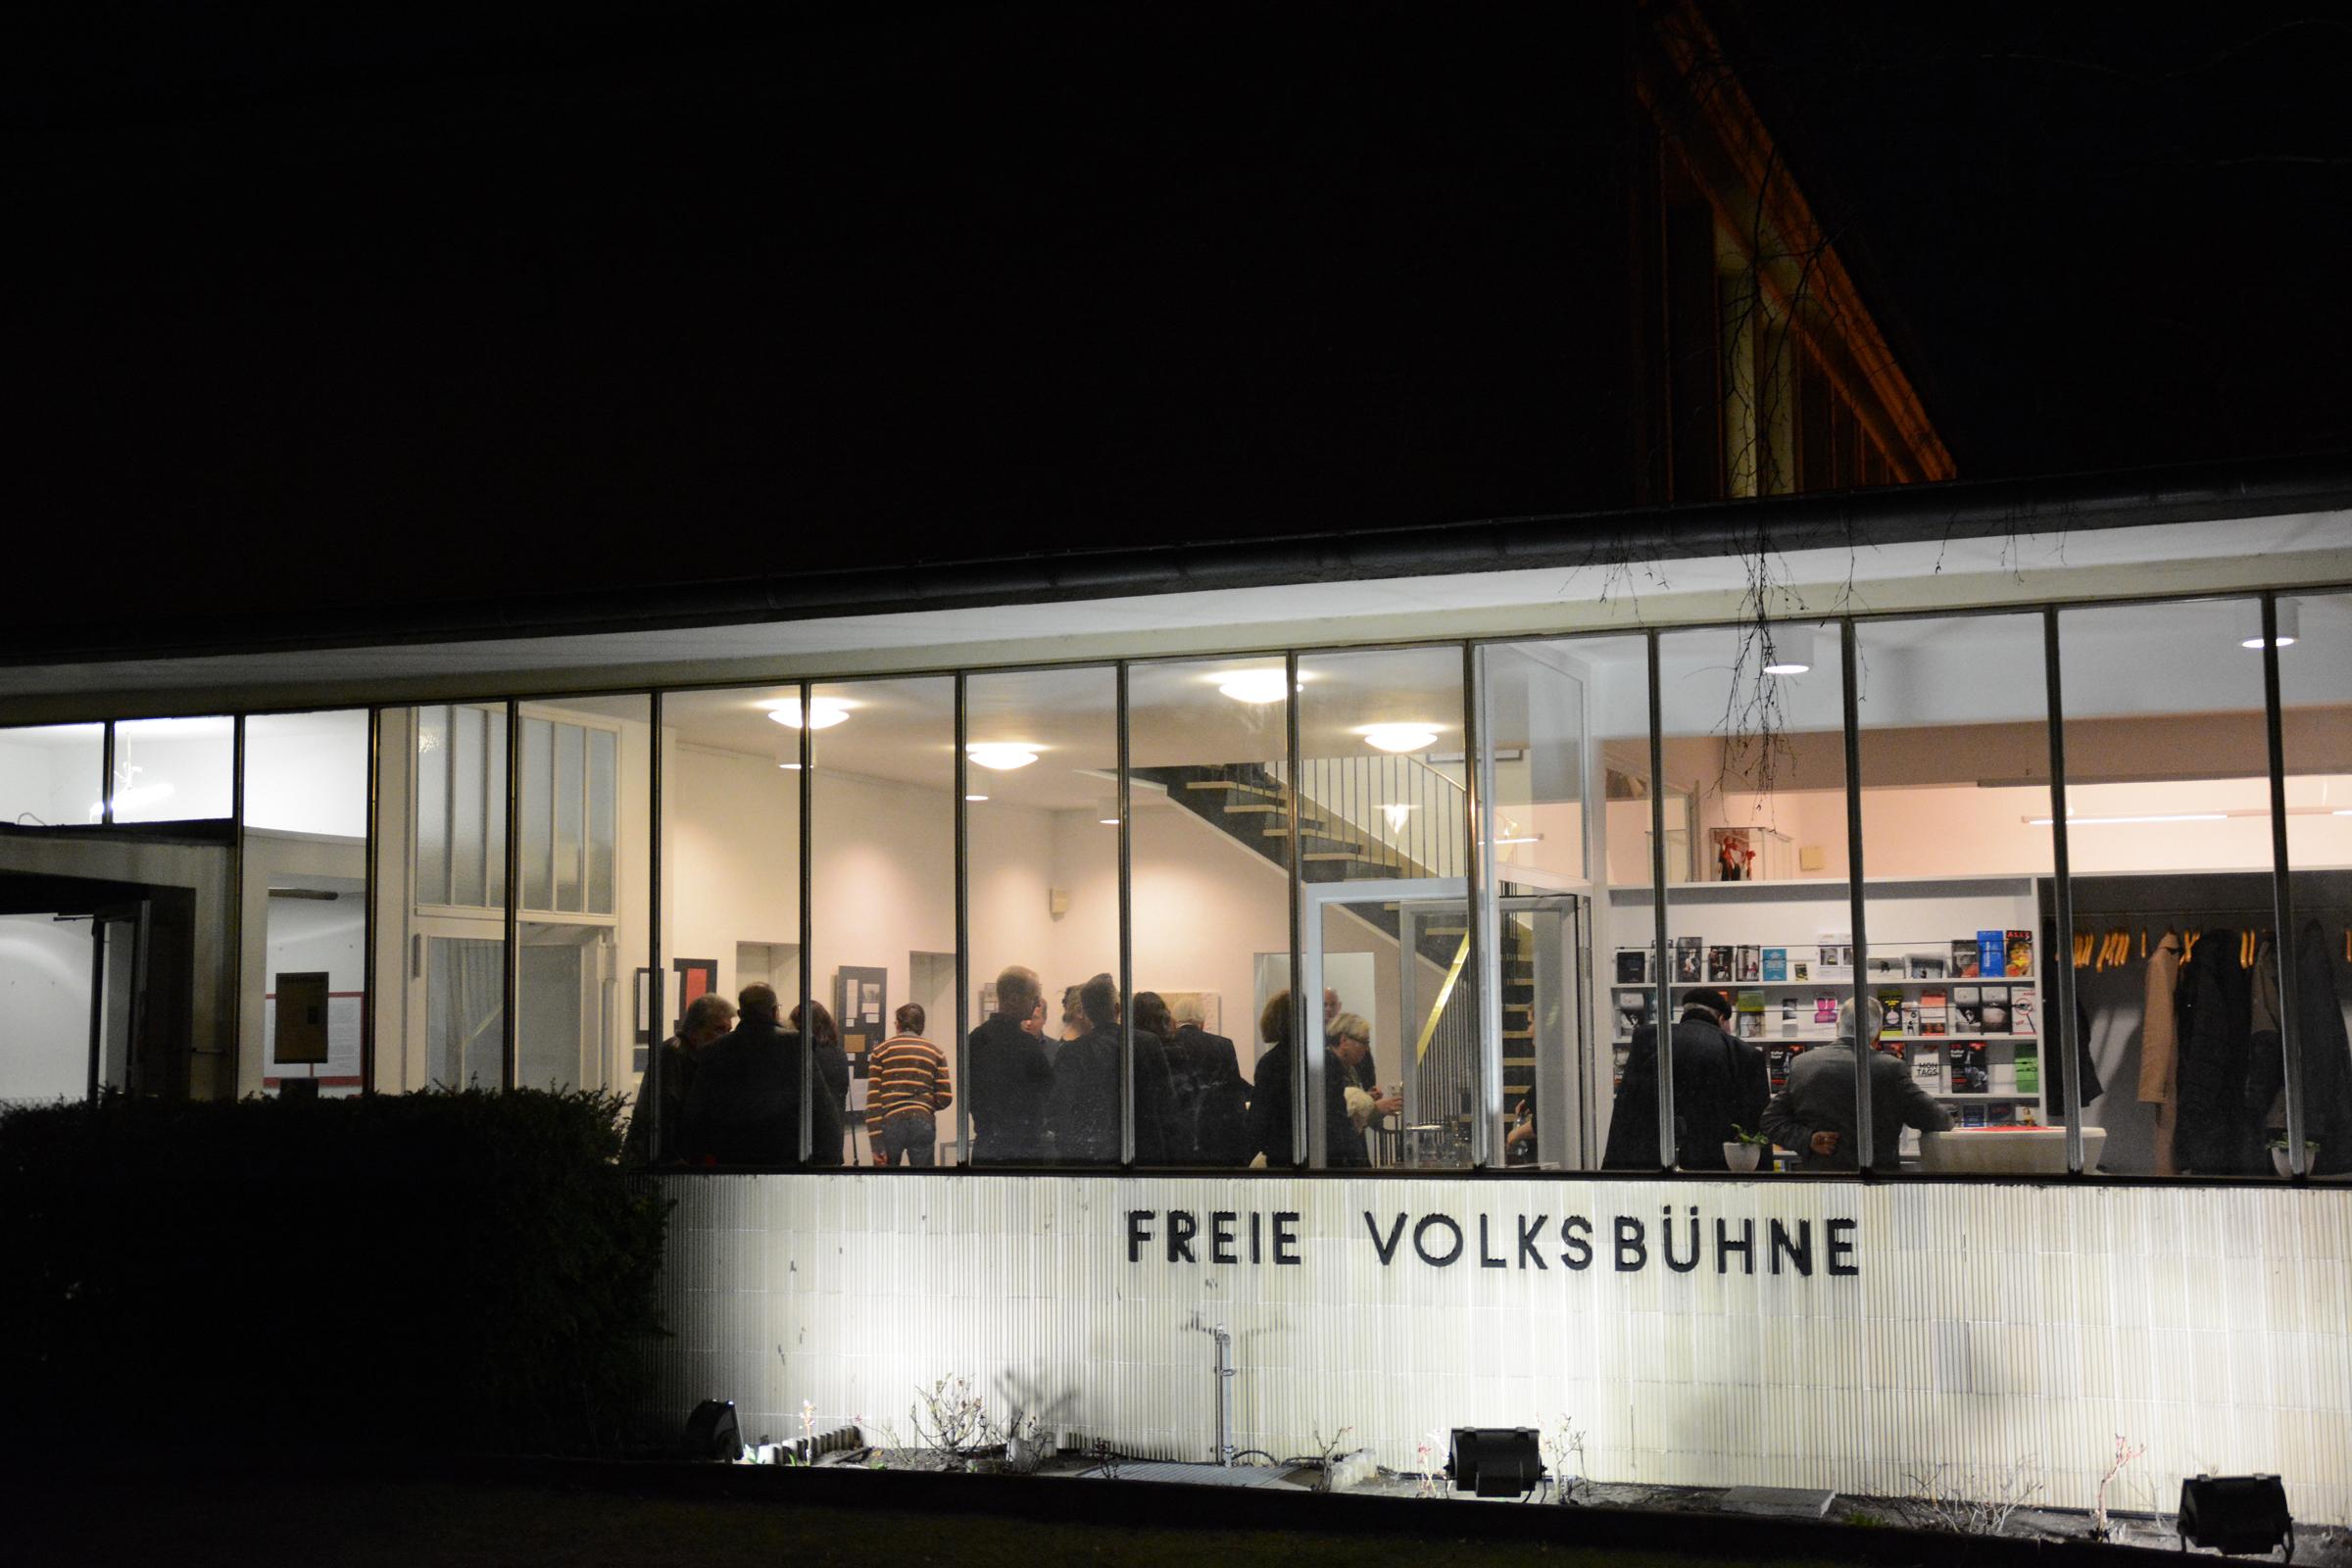 125 jahre freie volksb hne in berlin fotos aus berlin. Black Bedroom Furniture Sets. Home Design Ideas